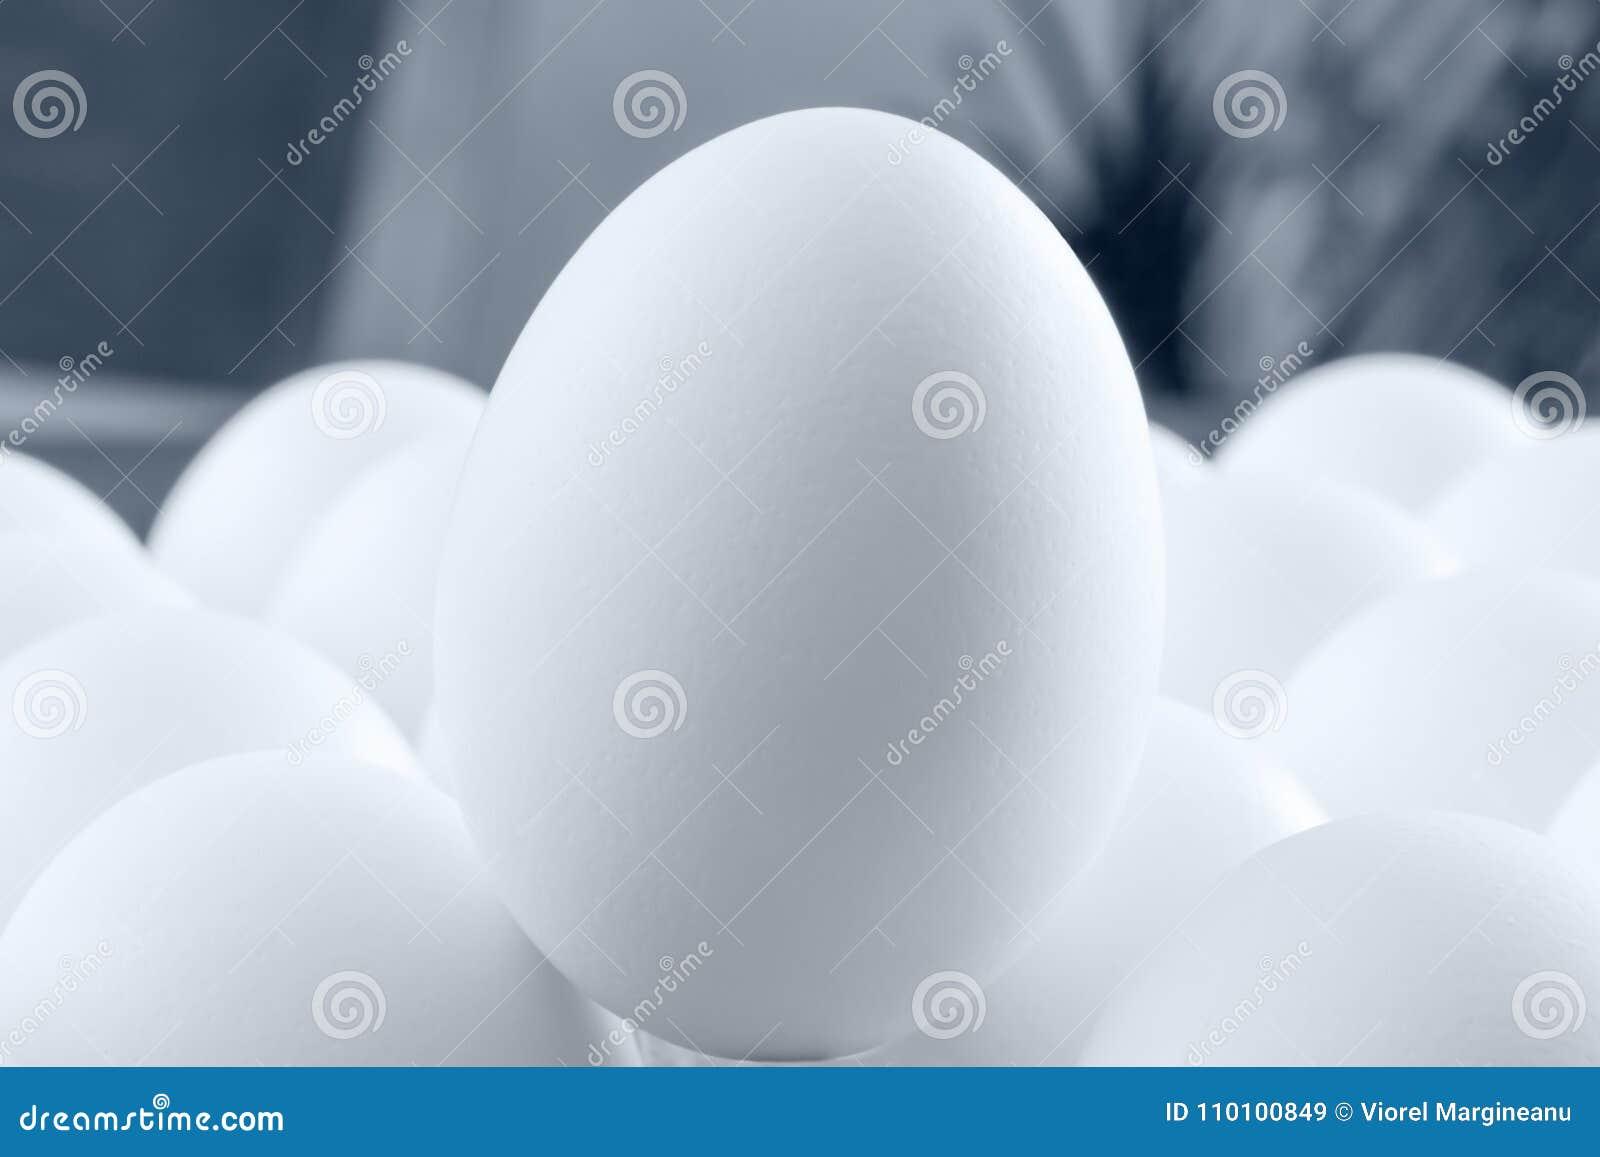 Opmerkelijk wit ei in extreme macrosleutel